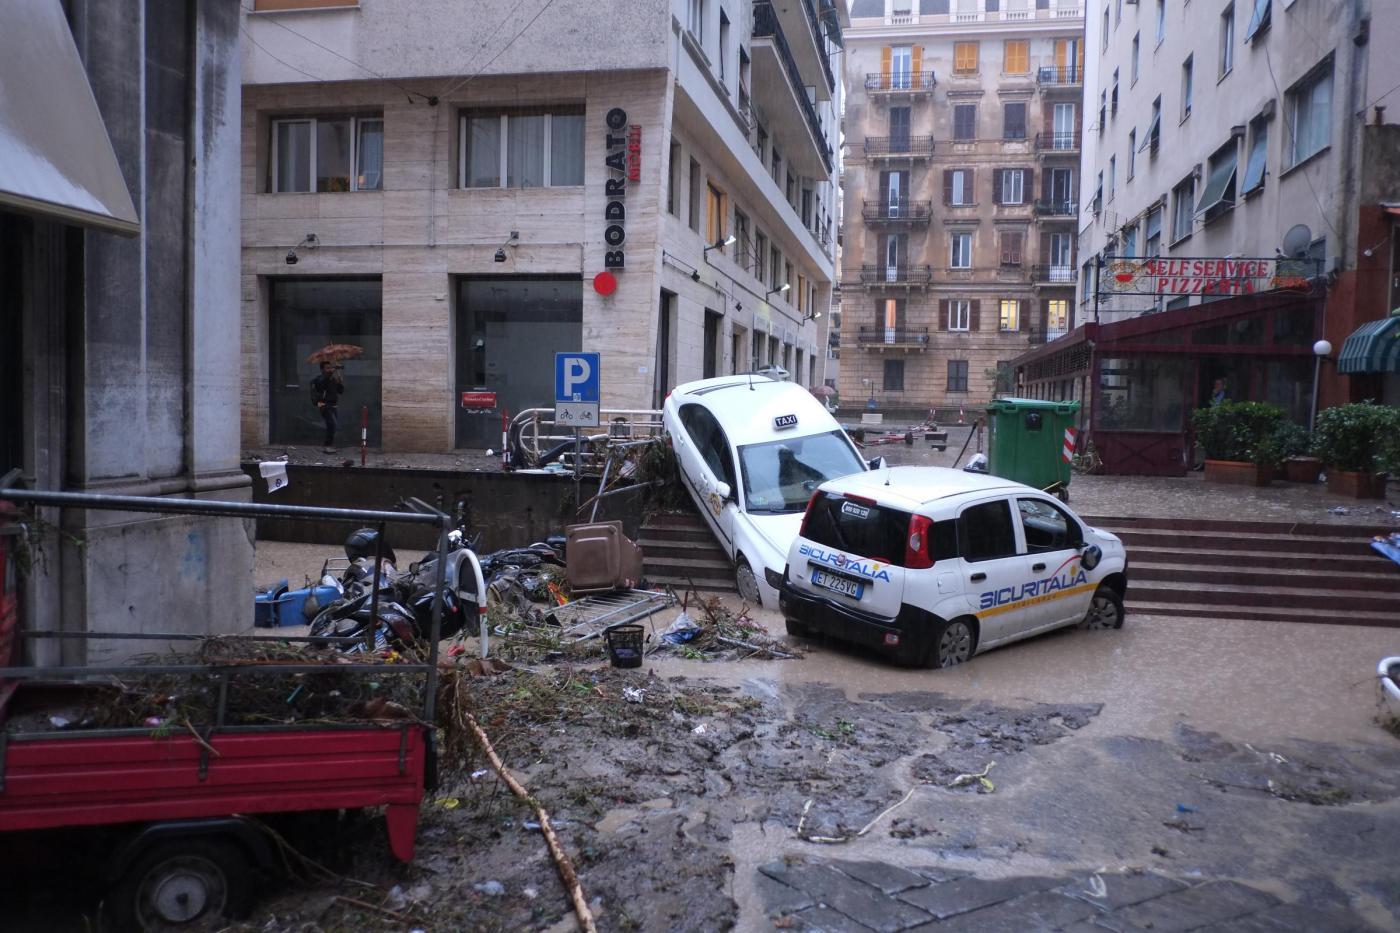 Genova alluvionata, esondano i fiumi